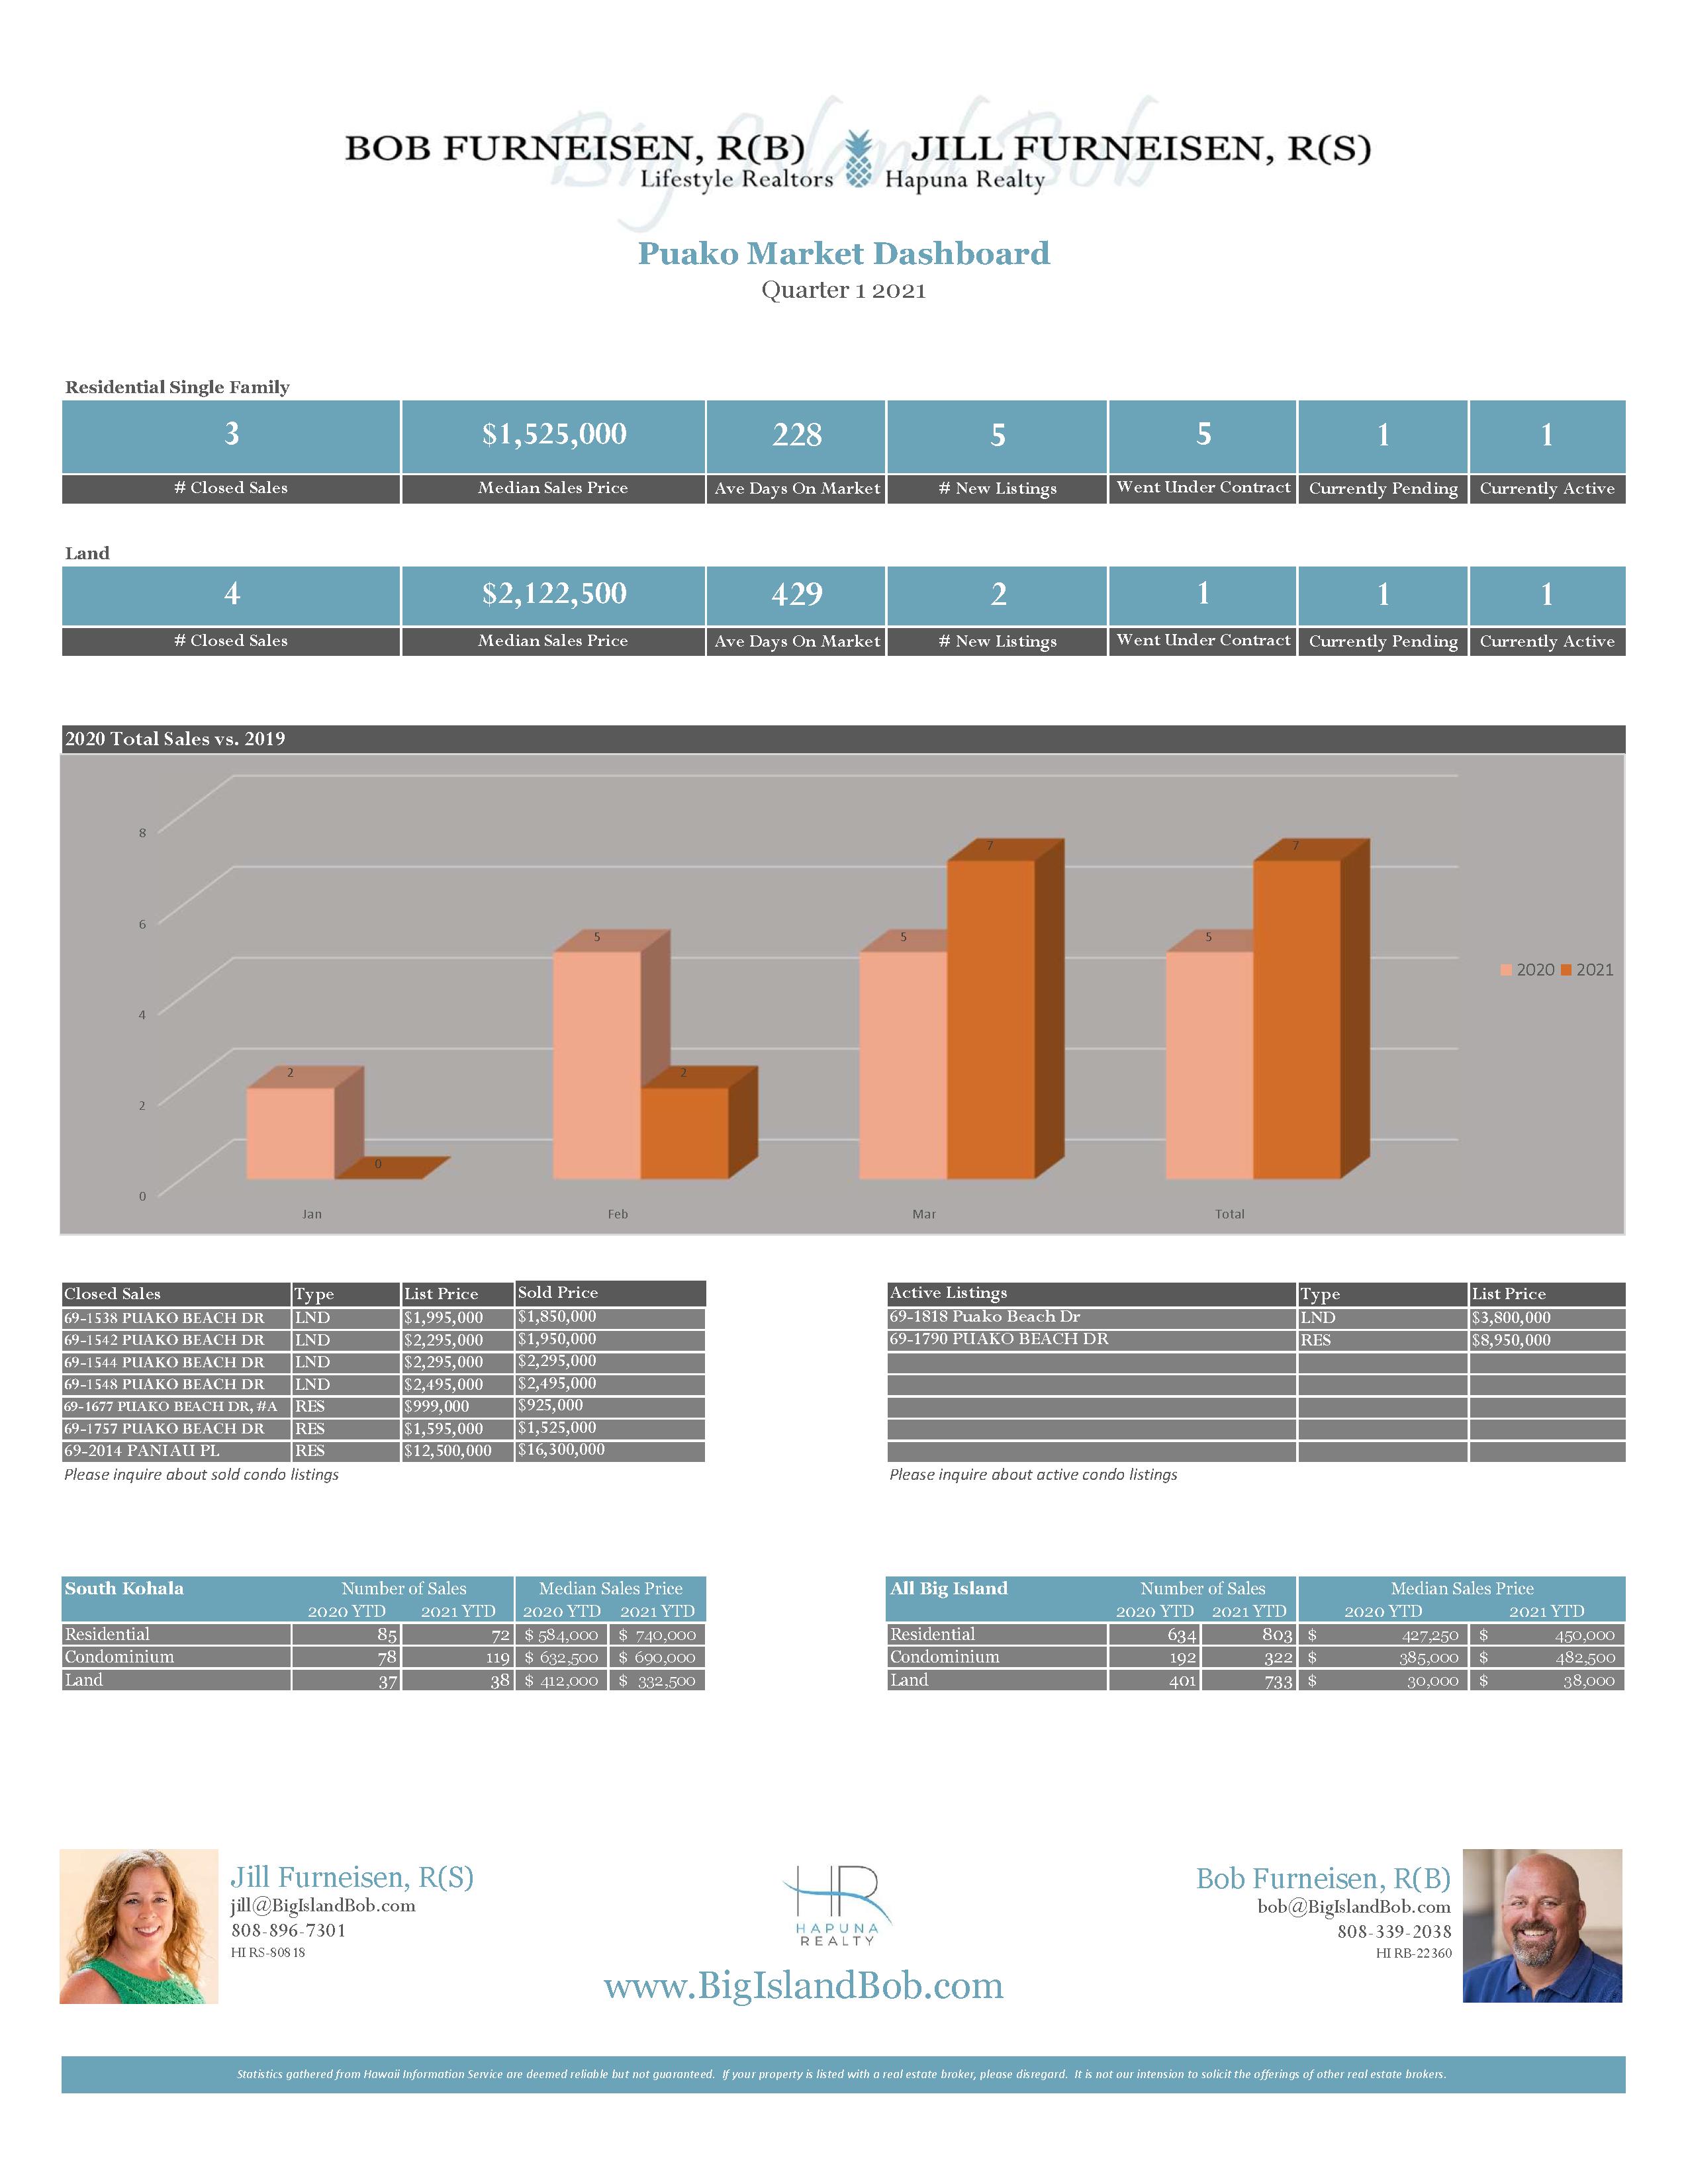 Puako Quarter 1 2021 Real Estate Market Dashboard